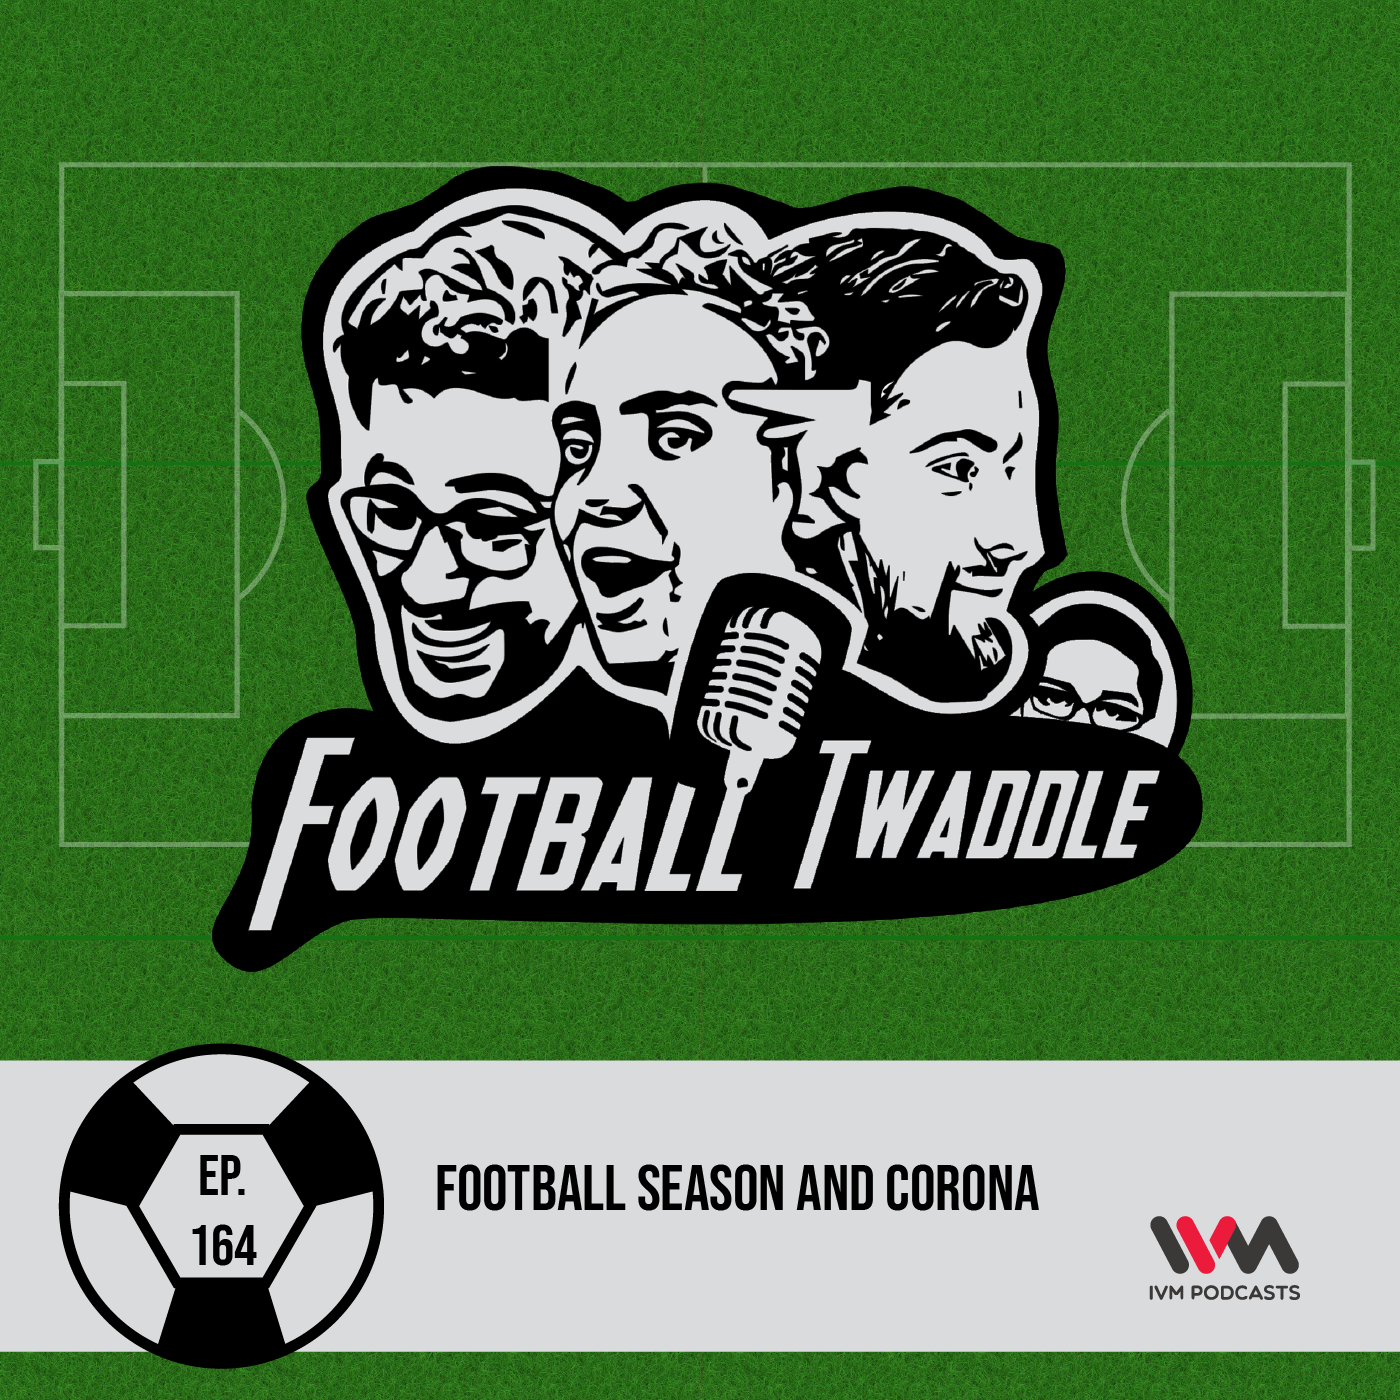 Football Season And Corona